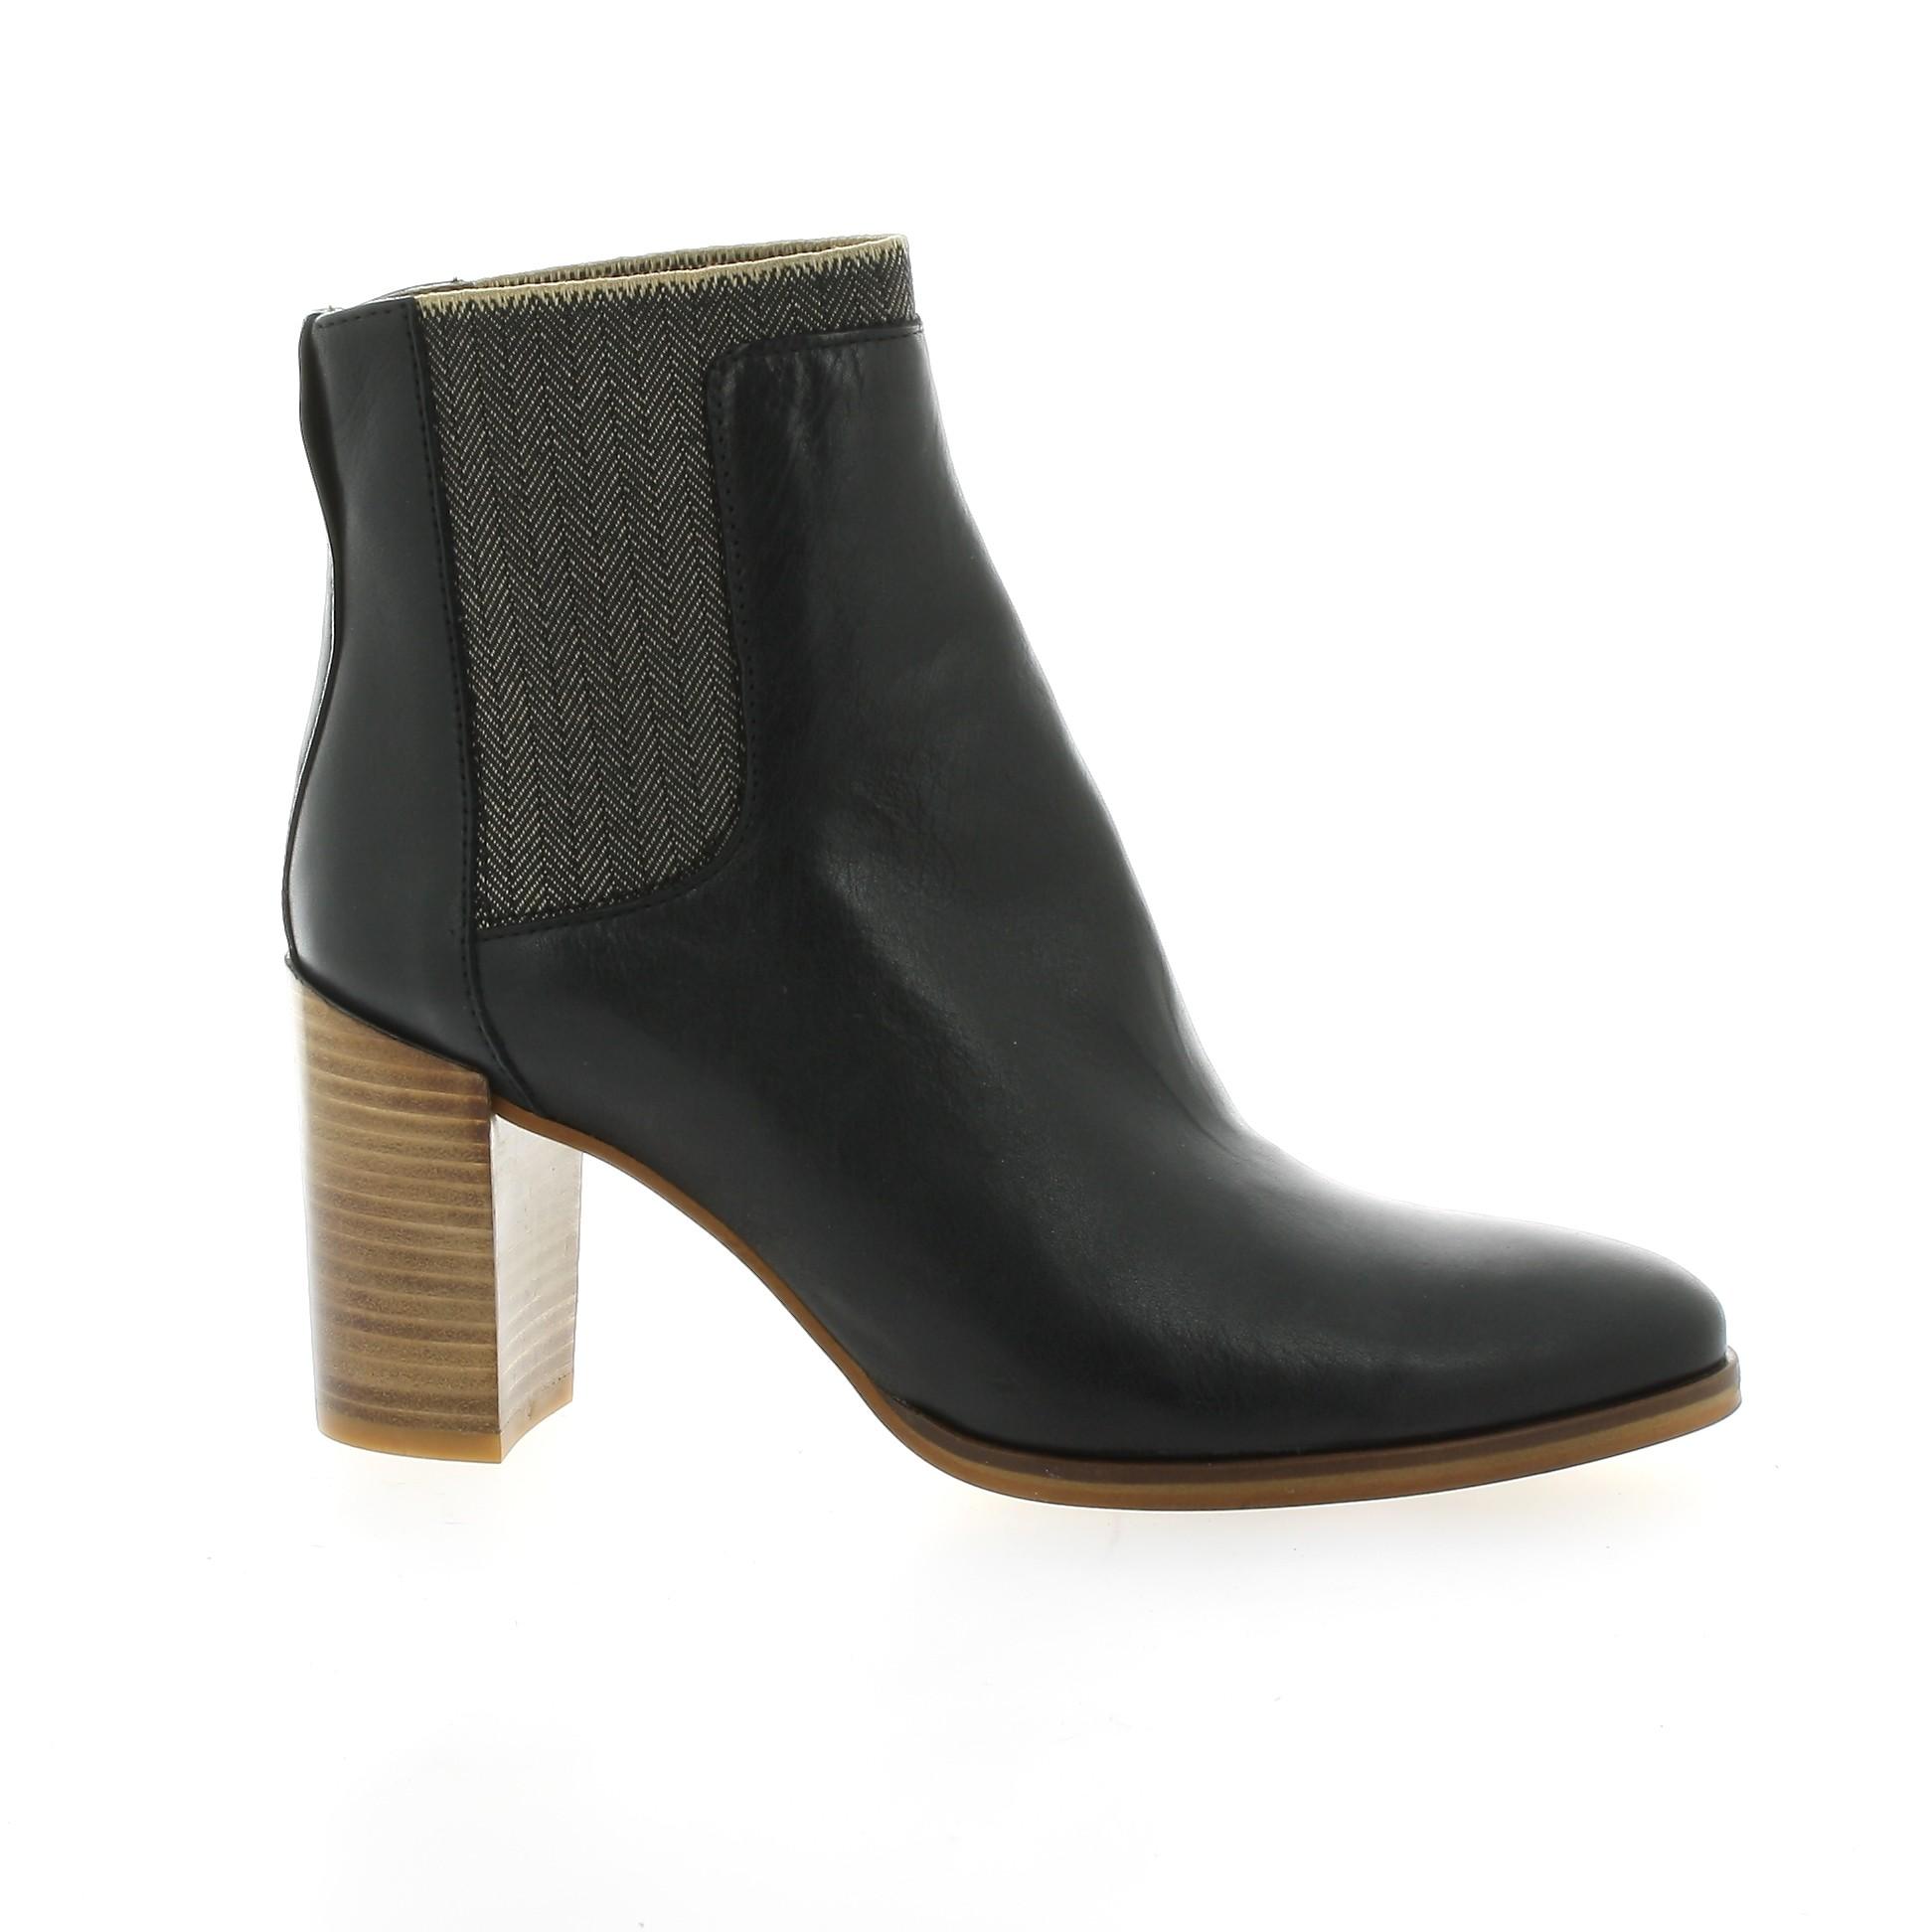 4676e1c04ab ... minka design boots cuir noir